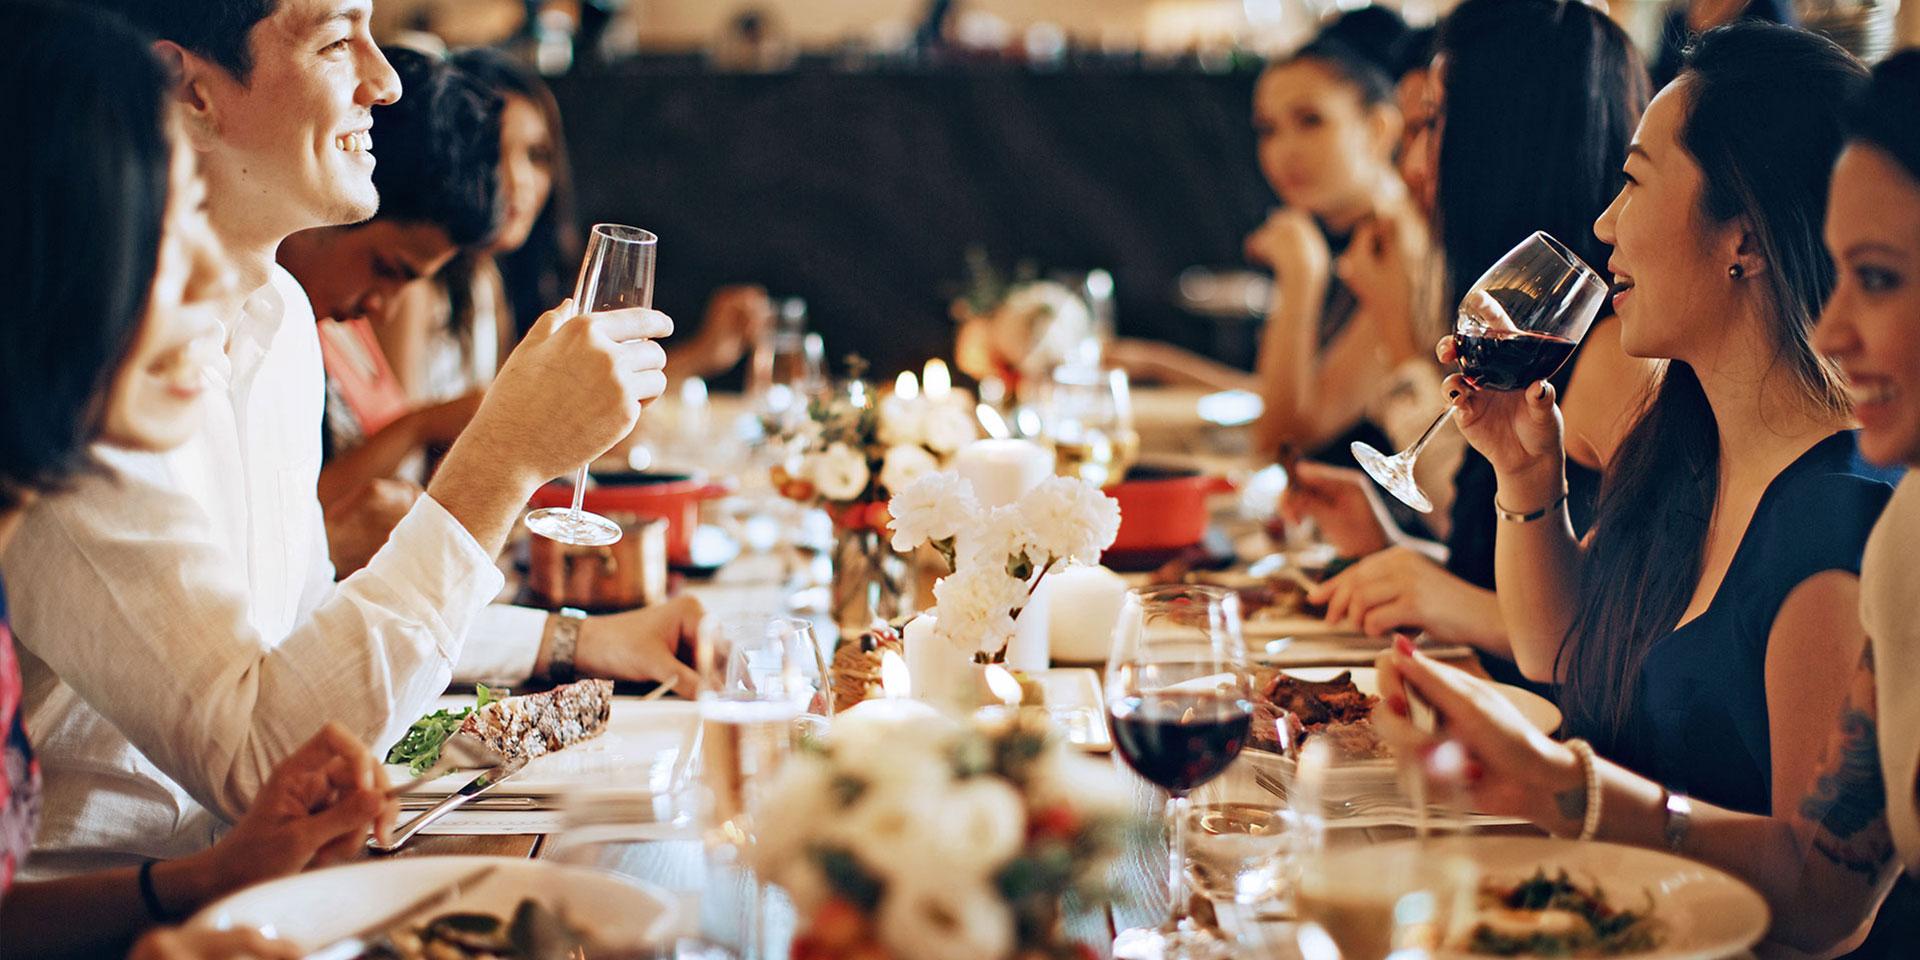 perfect-wedding-venue-singapore-venuerific-blog-the-white-rabbit-celebration